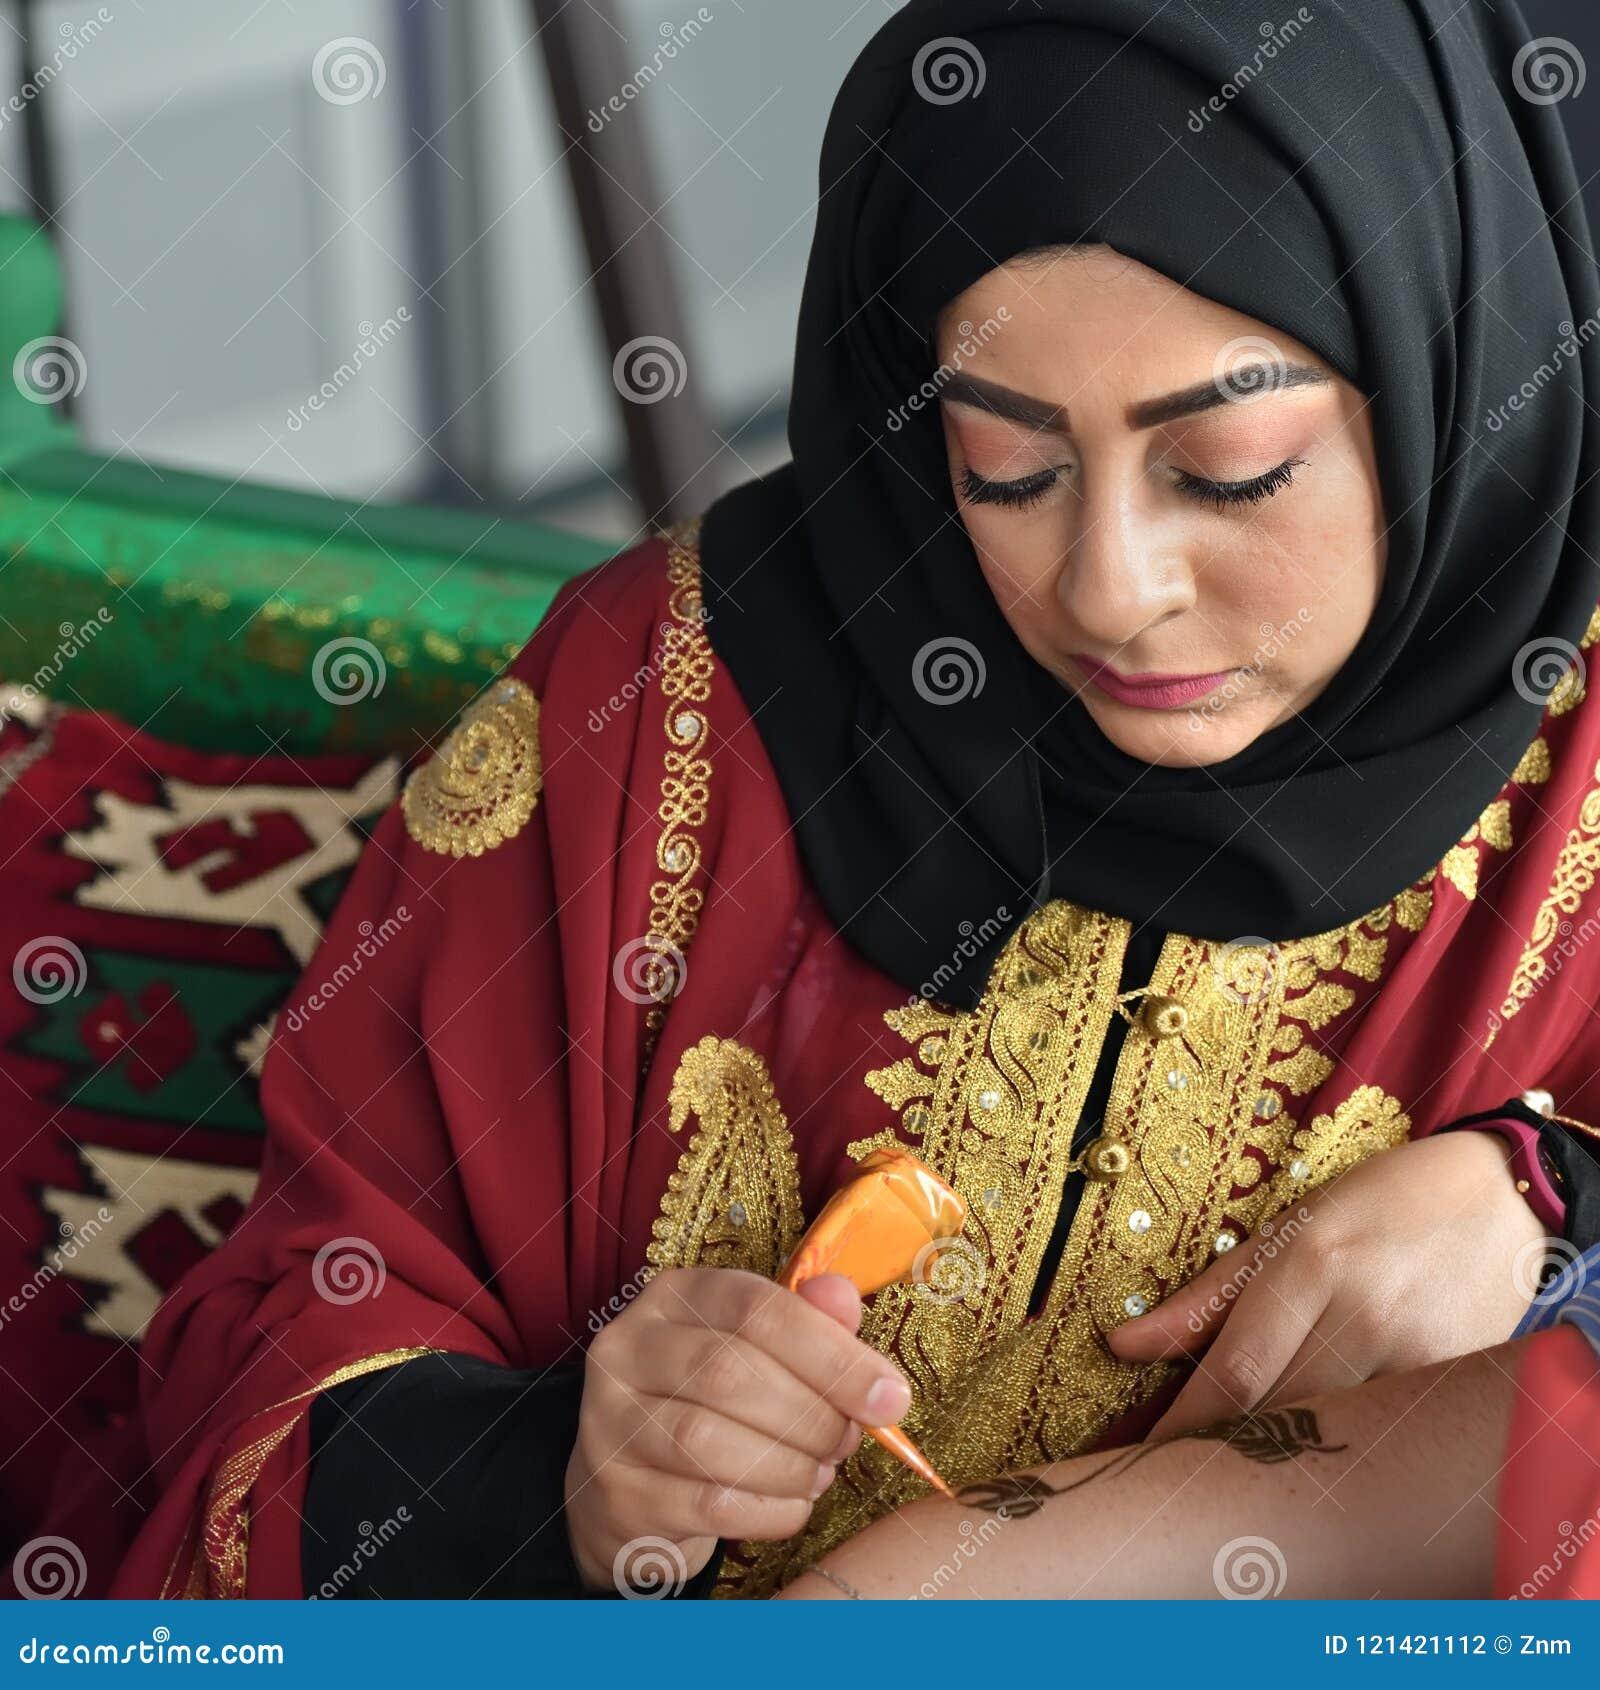 Mehndi Henny Tatuaż Mehndi Applier Przy Pracą Lub Henna